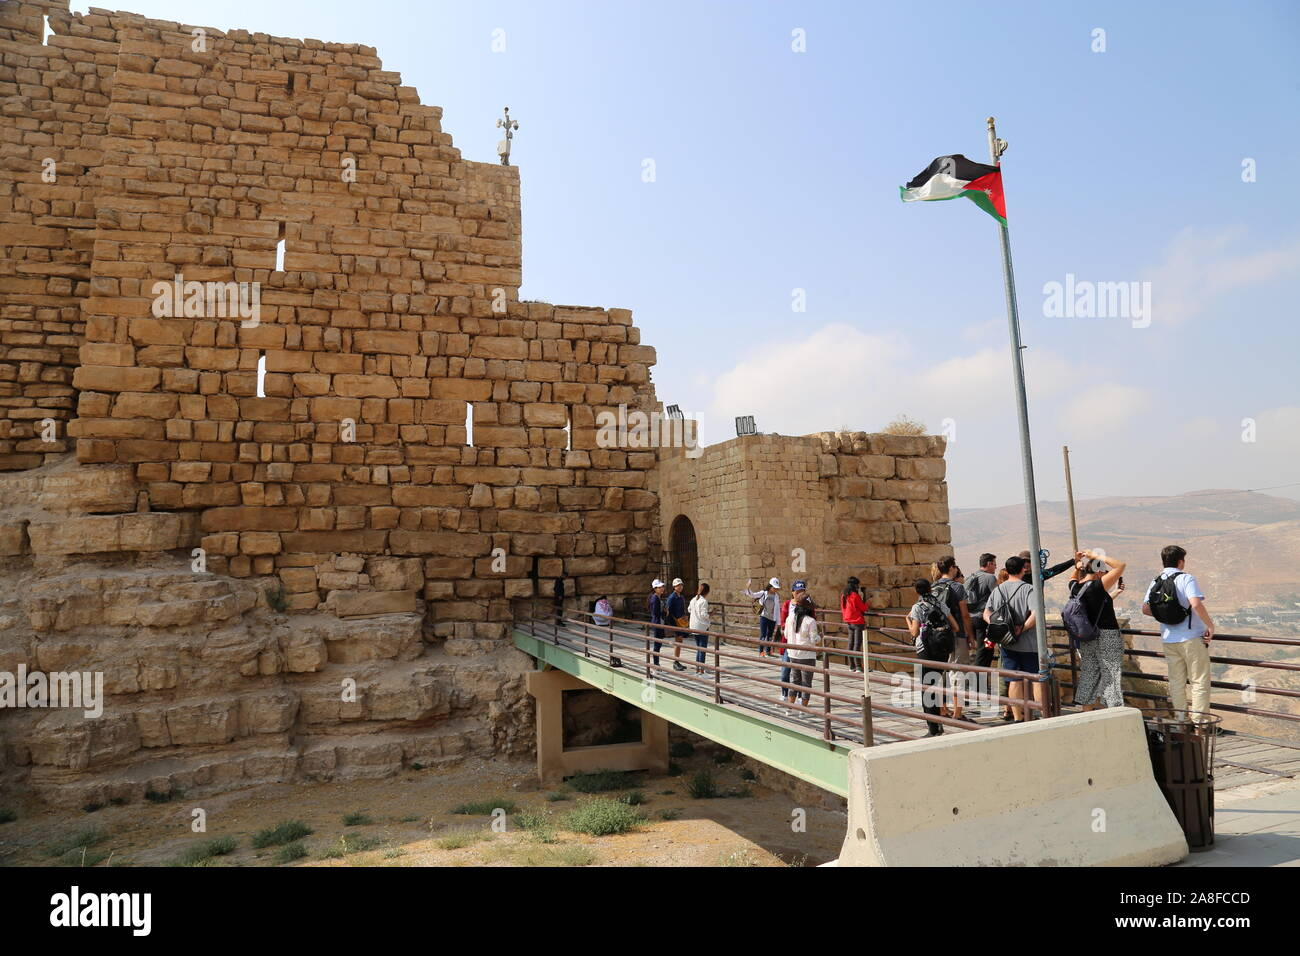 Ottoman's Gate, Karak Castle, Al Karak, Karak Governorate, Jordan, Middle East Stock Photo